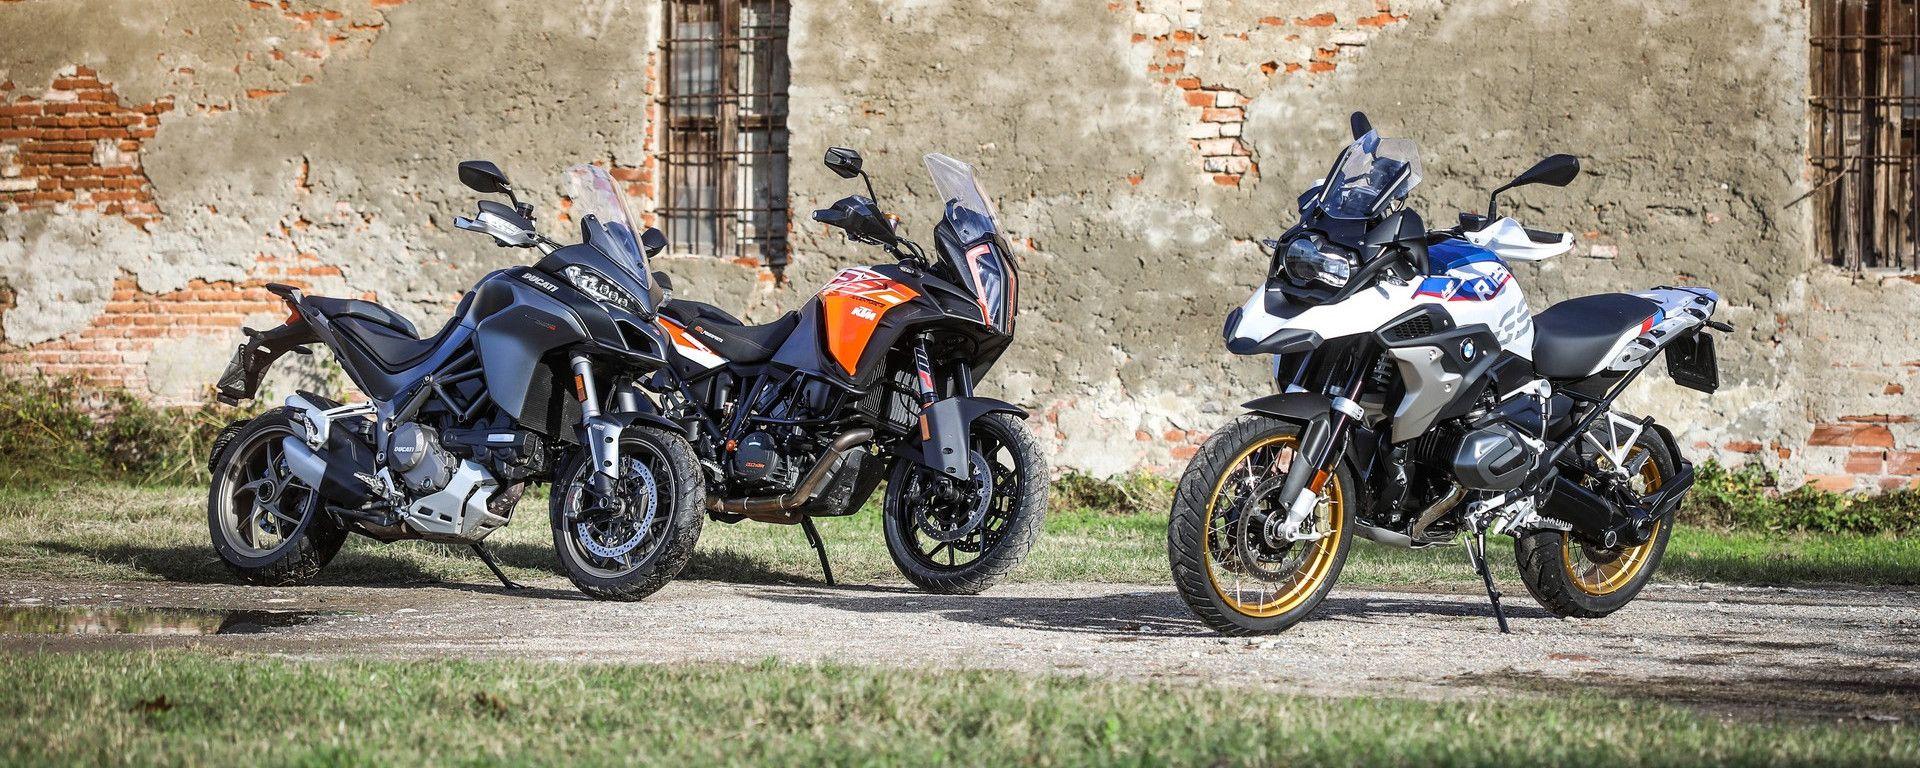 Da sinistra: Ducati Multistrada 1260, KTM 1290 Super Adventure, BMW R 1250 GS